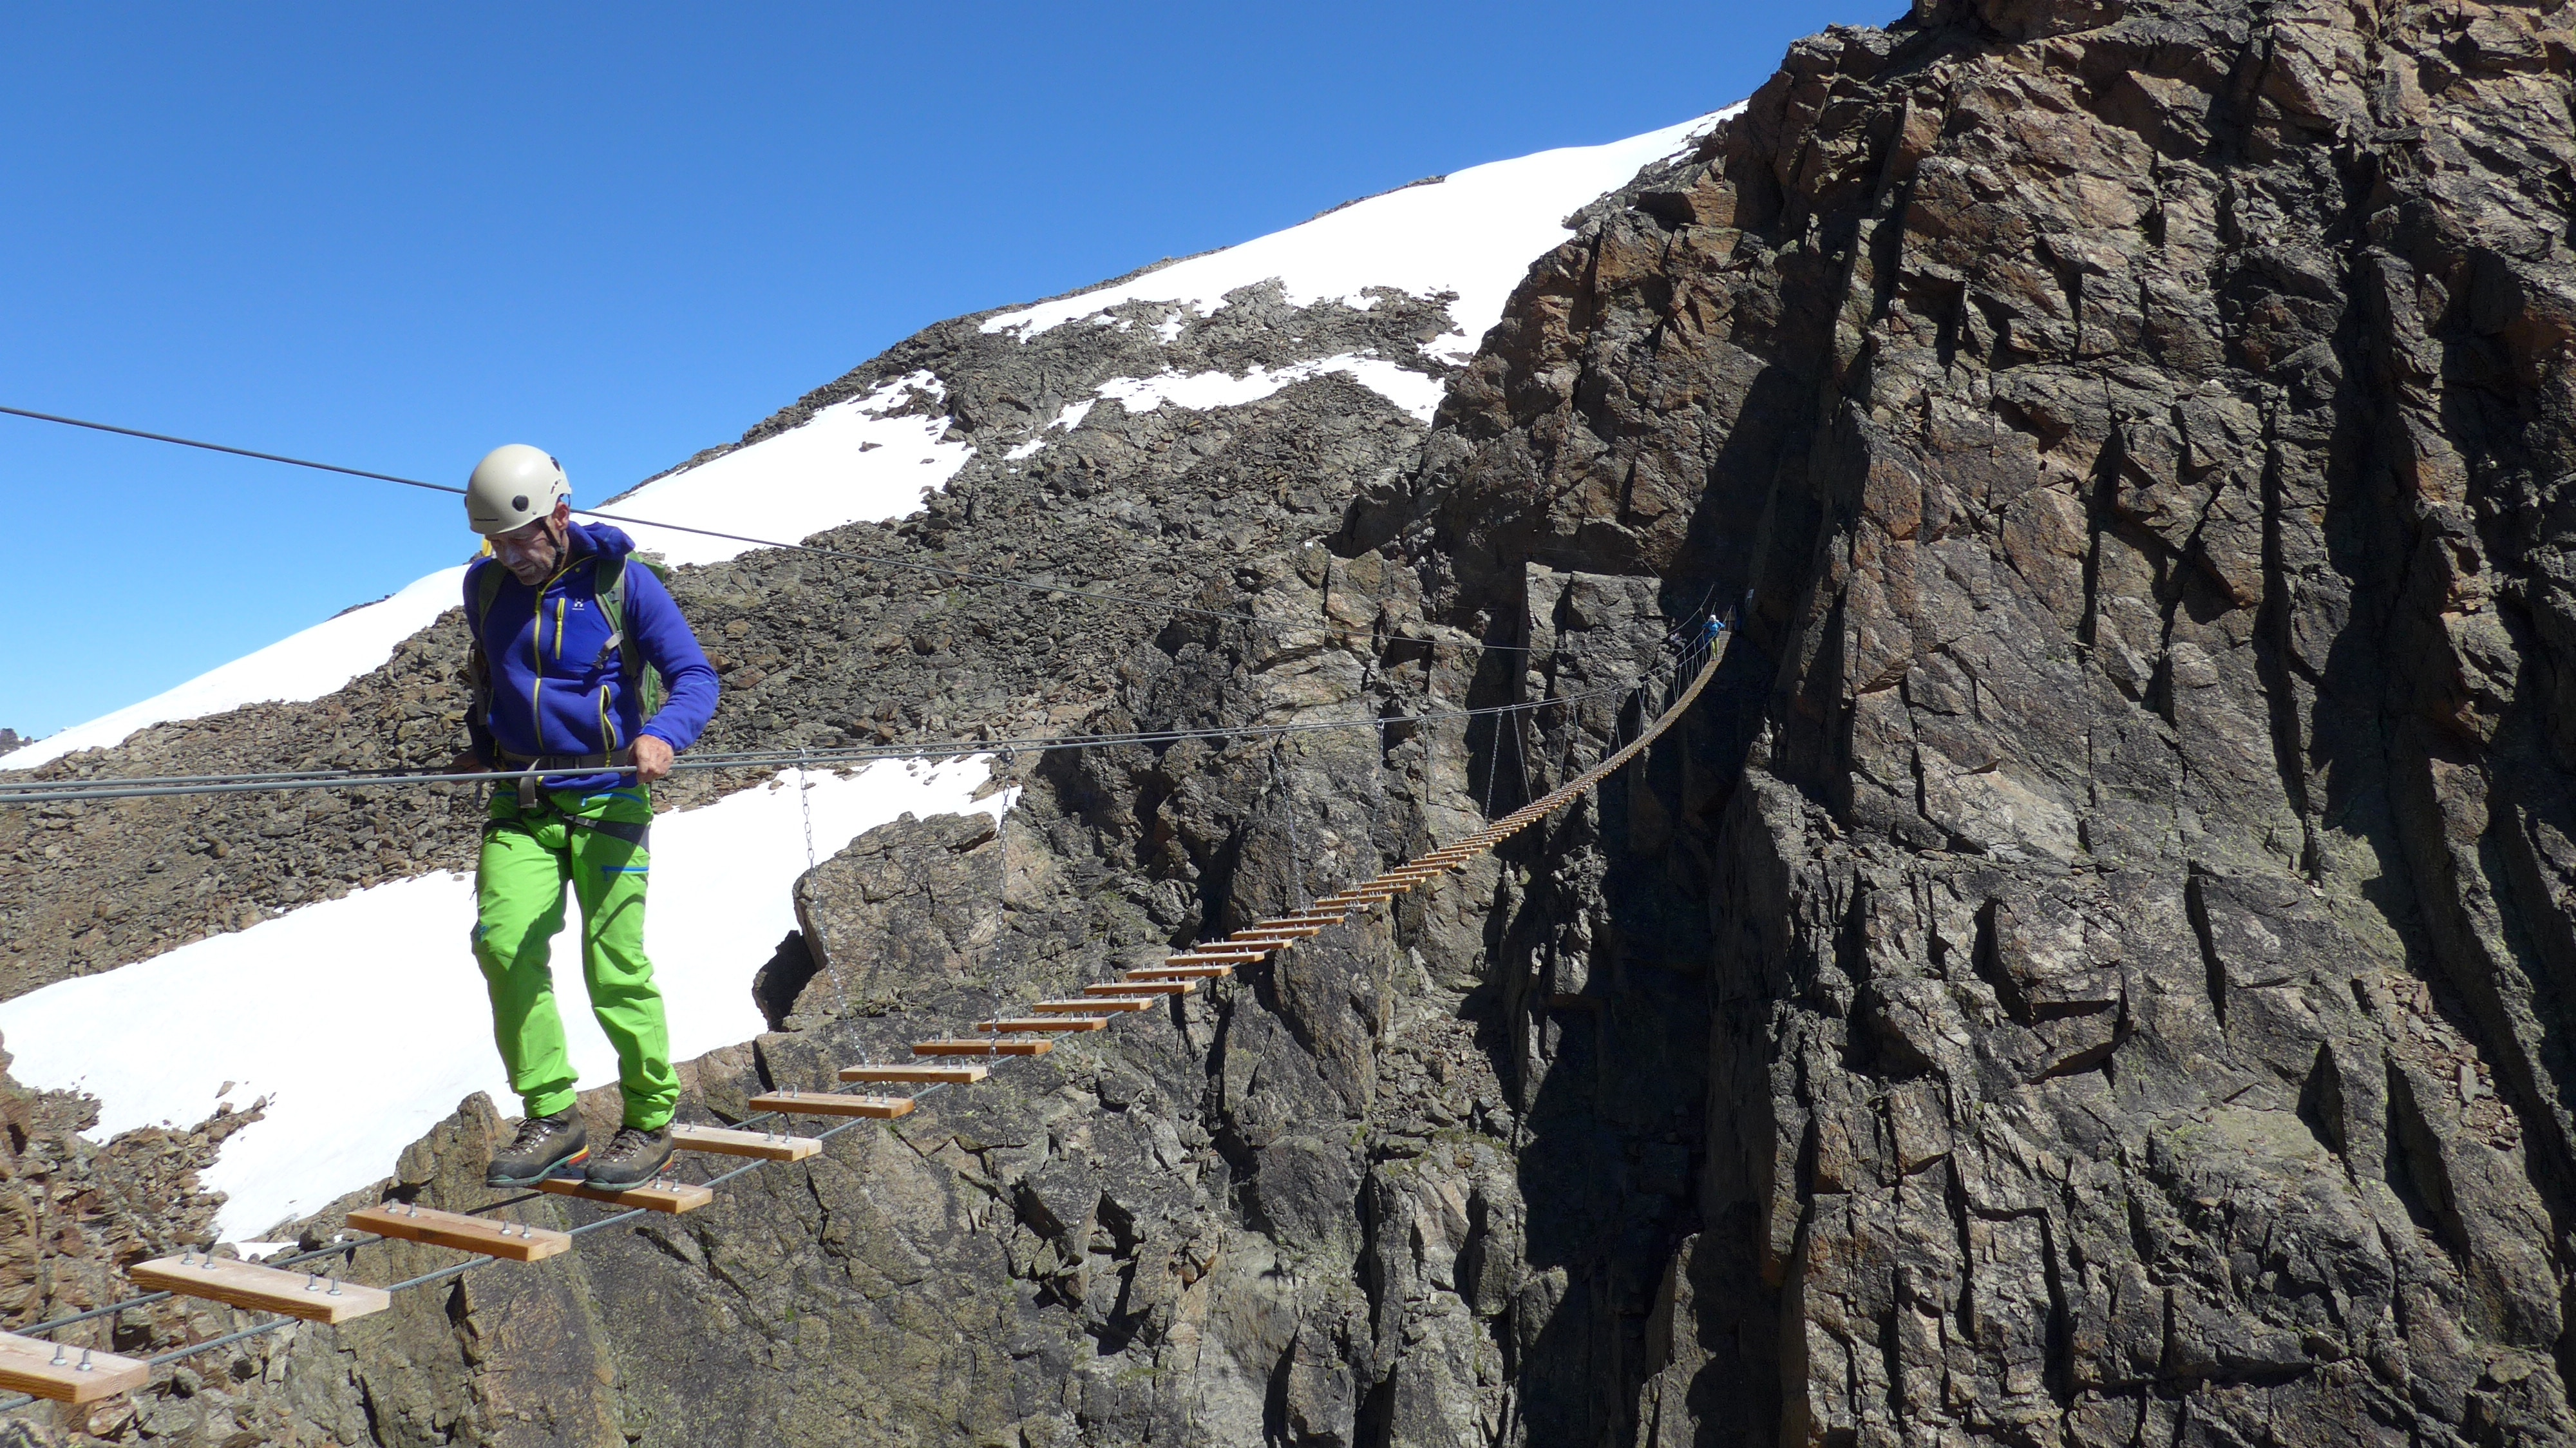 Klettersteig Jegihorn : Klettersteige: klettersteig jägihorn 11km bergwelten